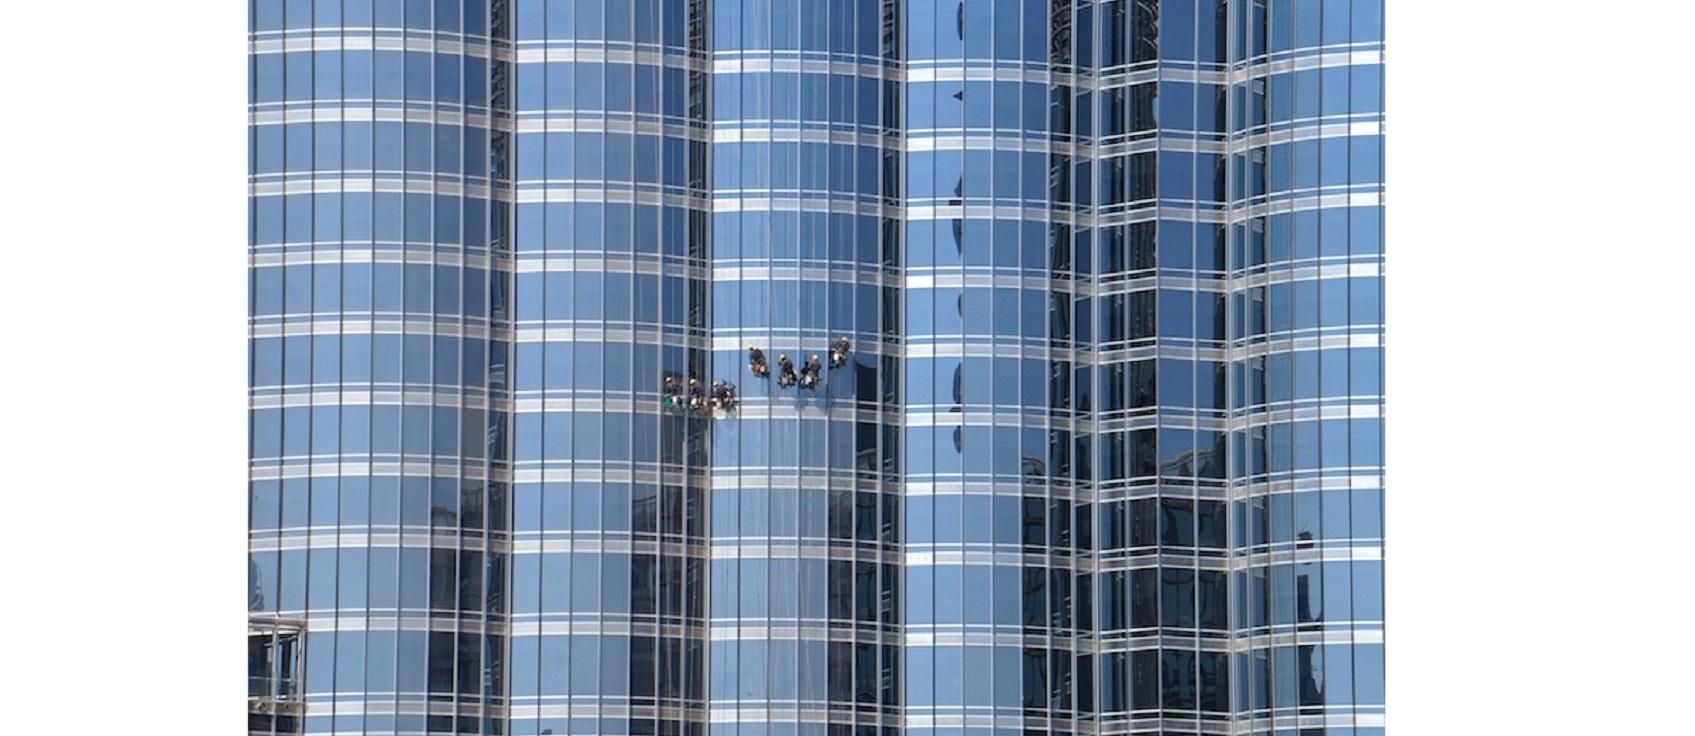 burj khalifa window